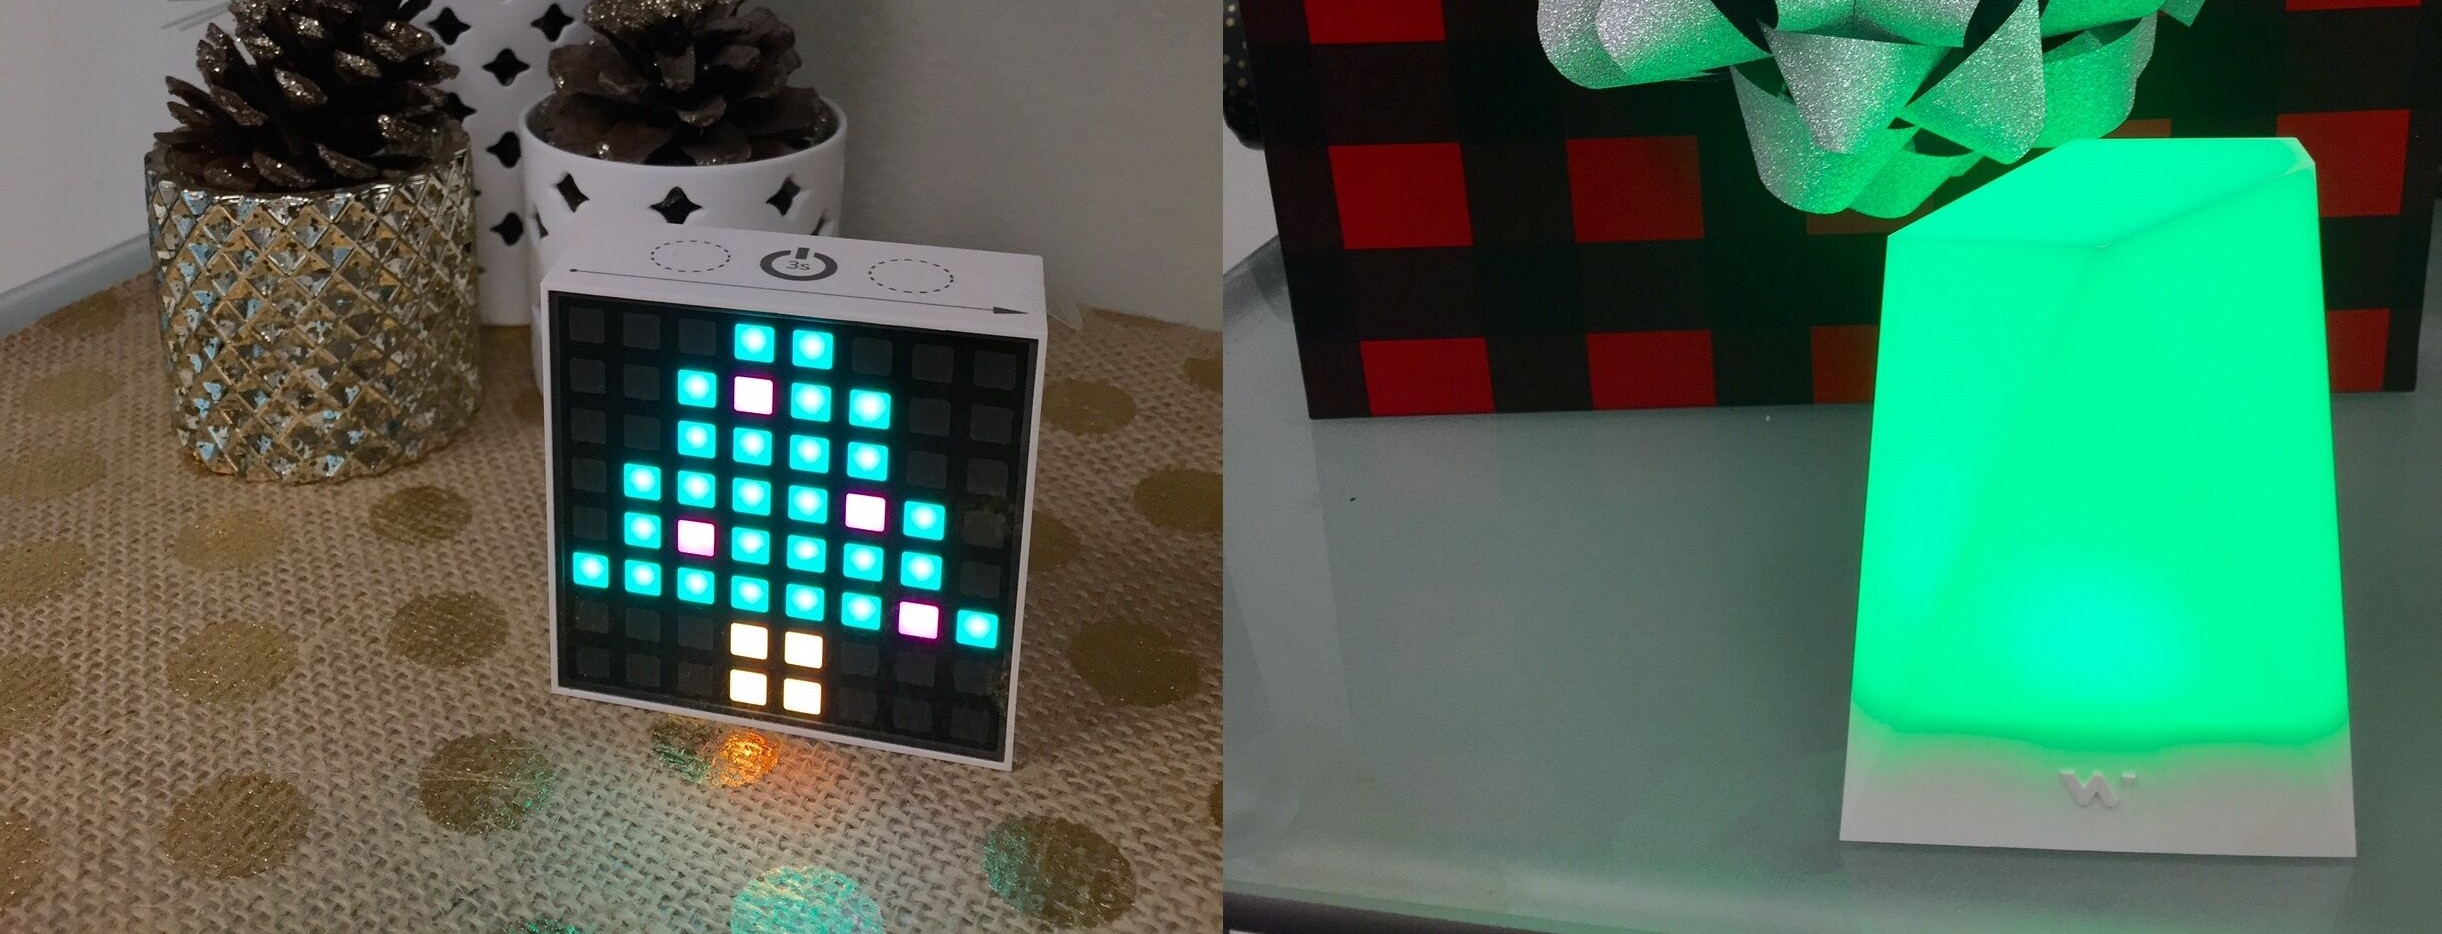 WITTI Smart Lights